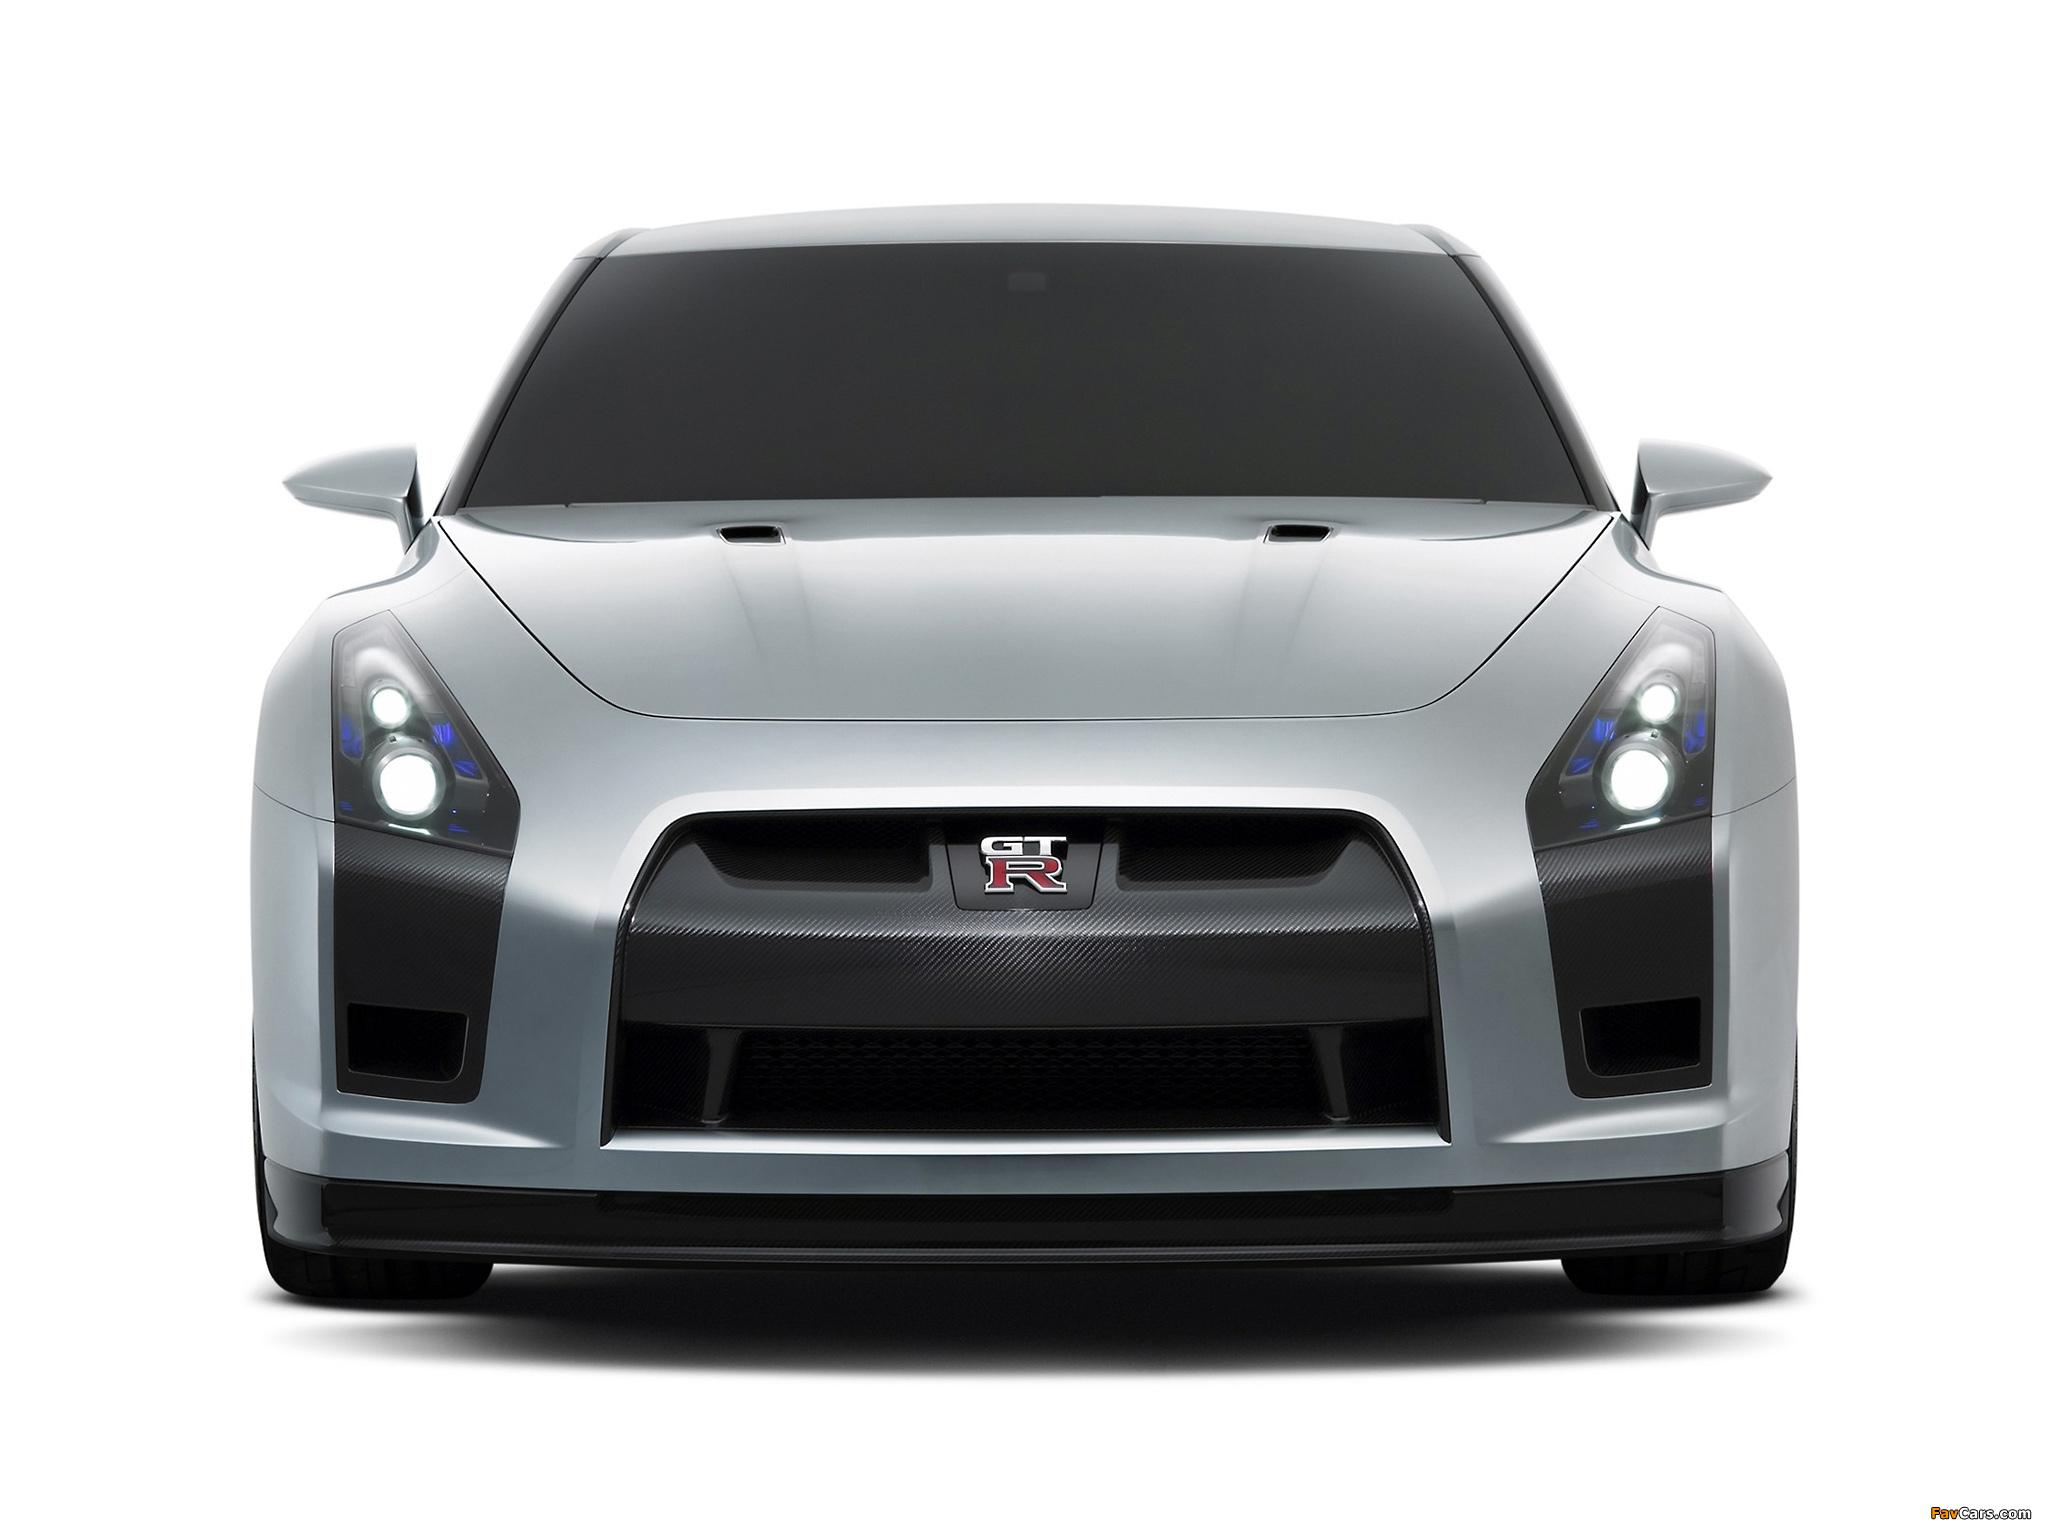 Nissan GT-R Proto Concept 2005 photos (2048 x 1536)